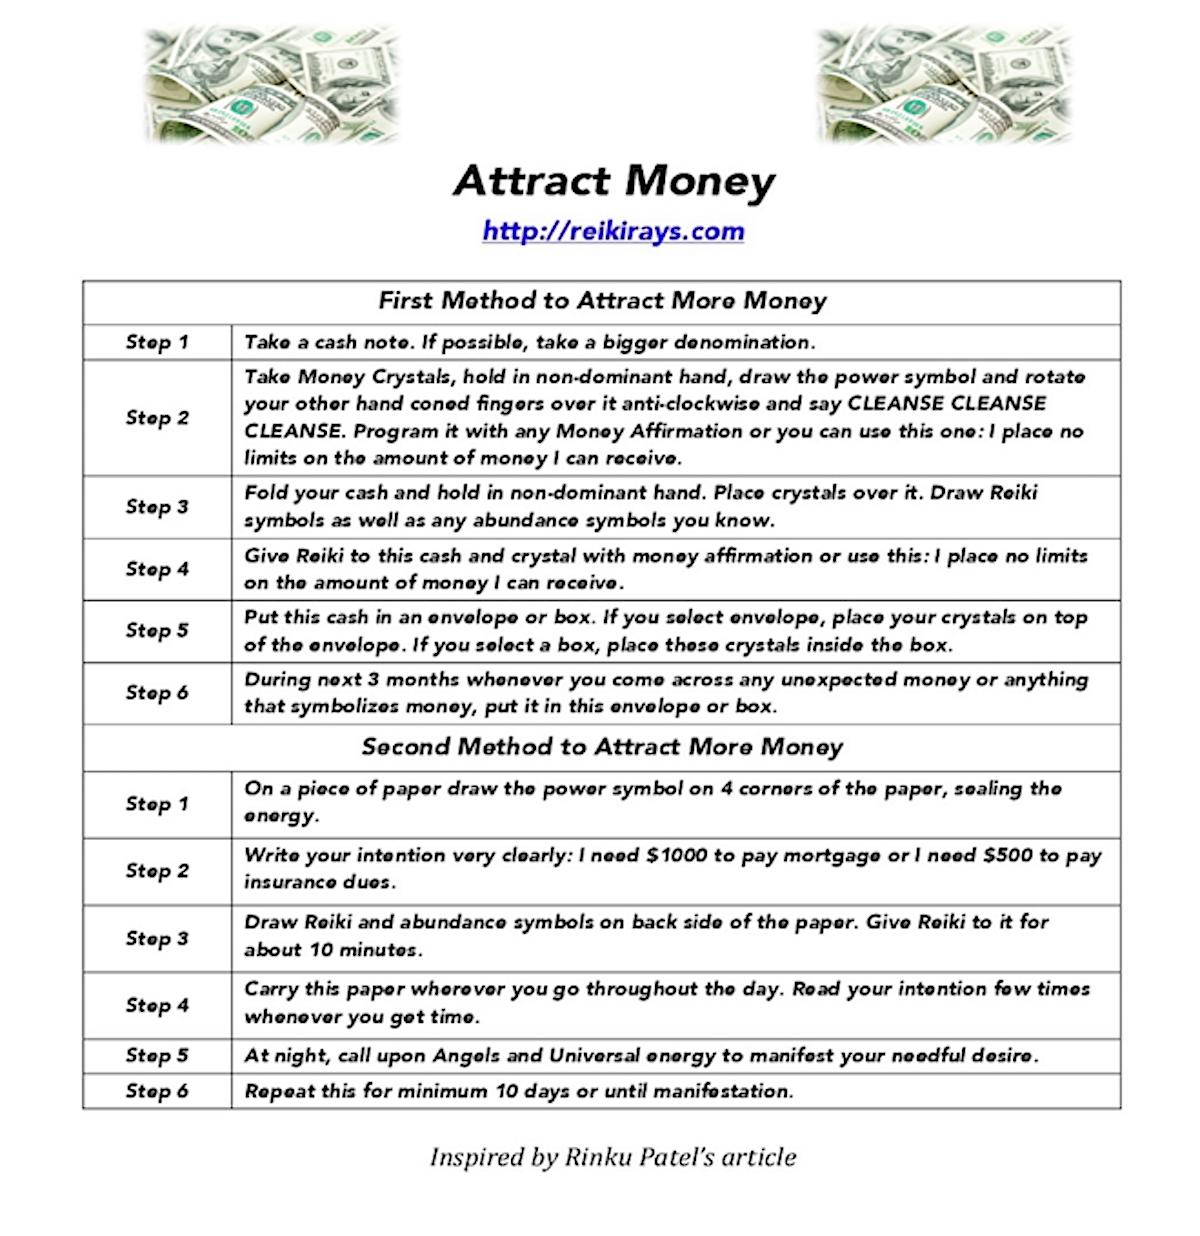 Attract Money